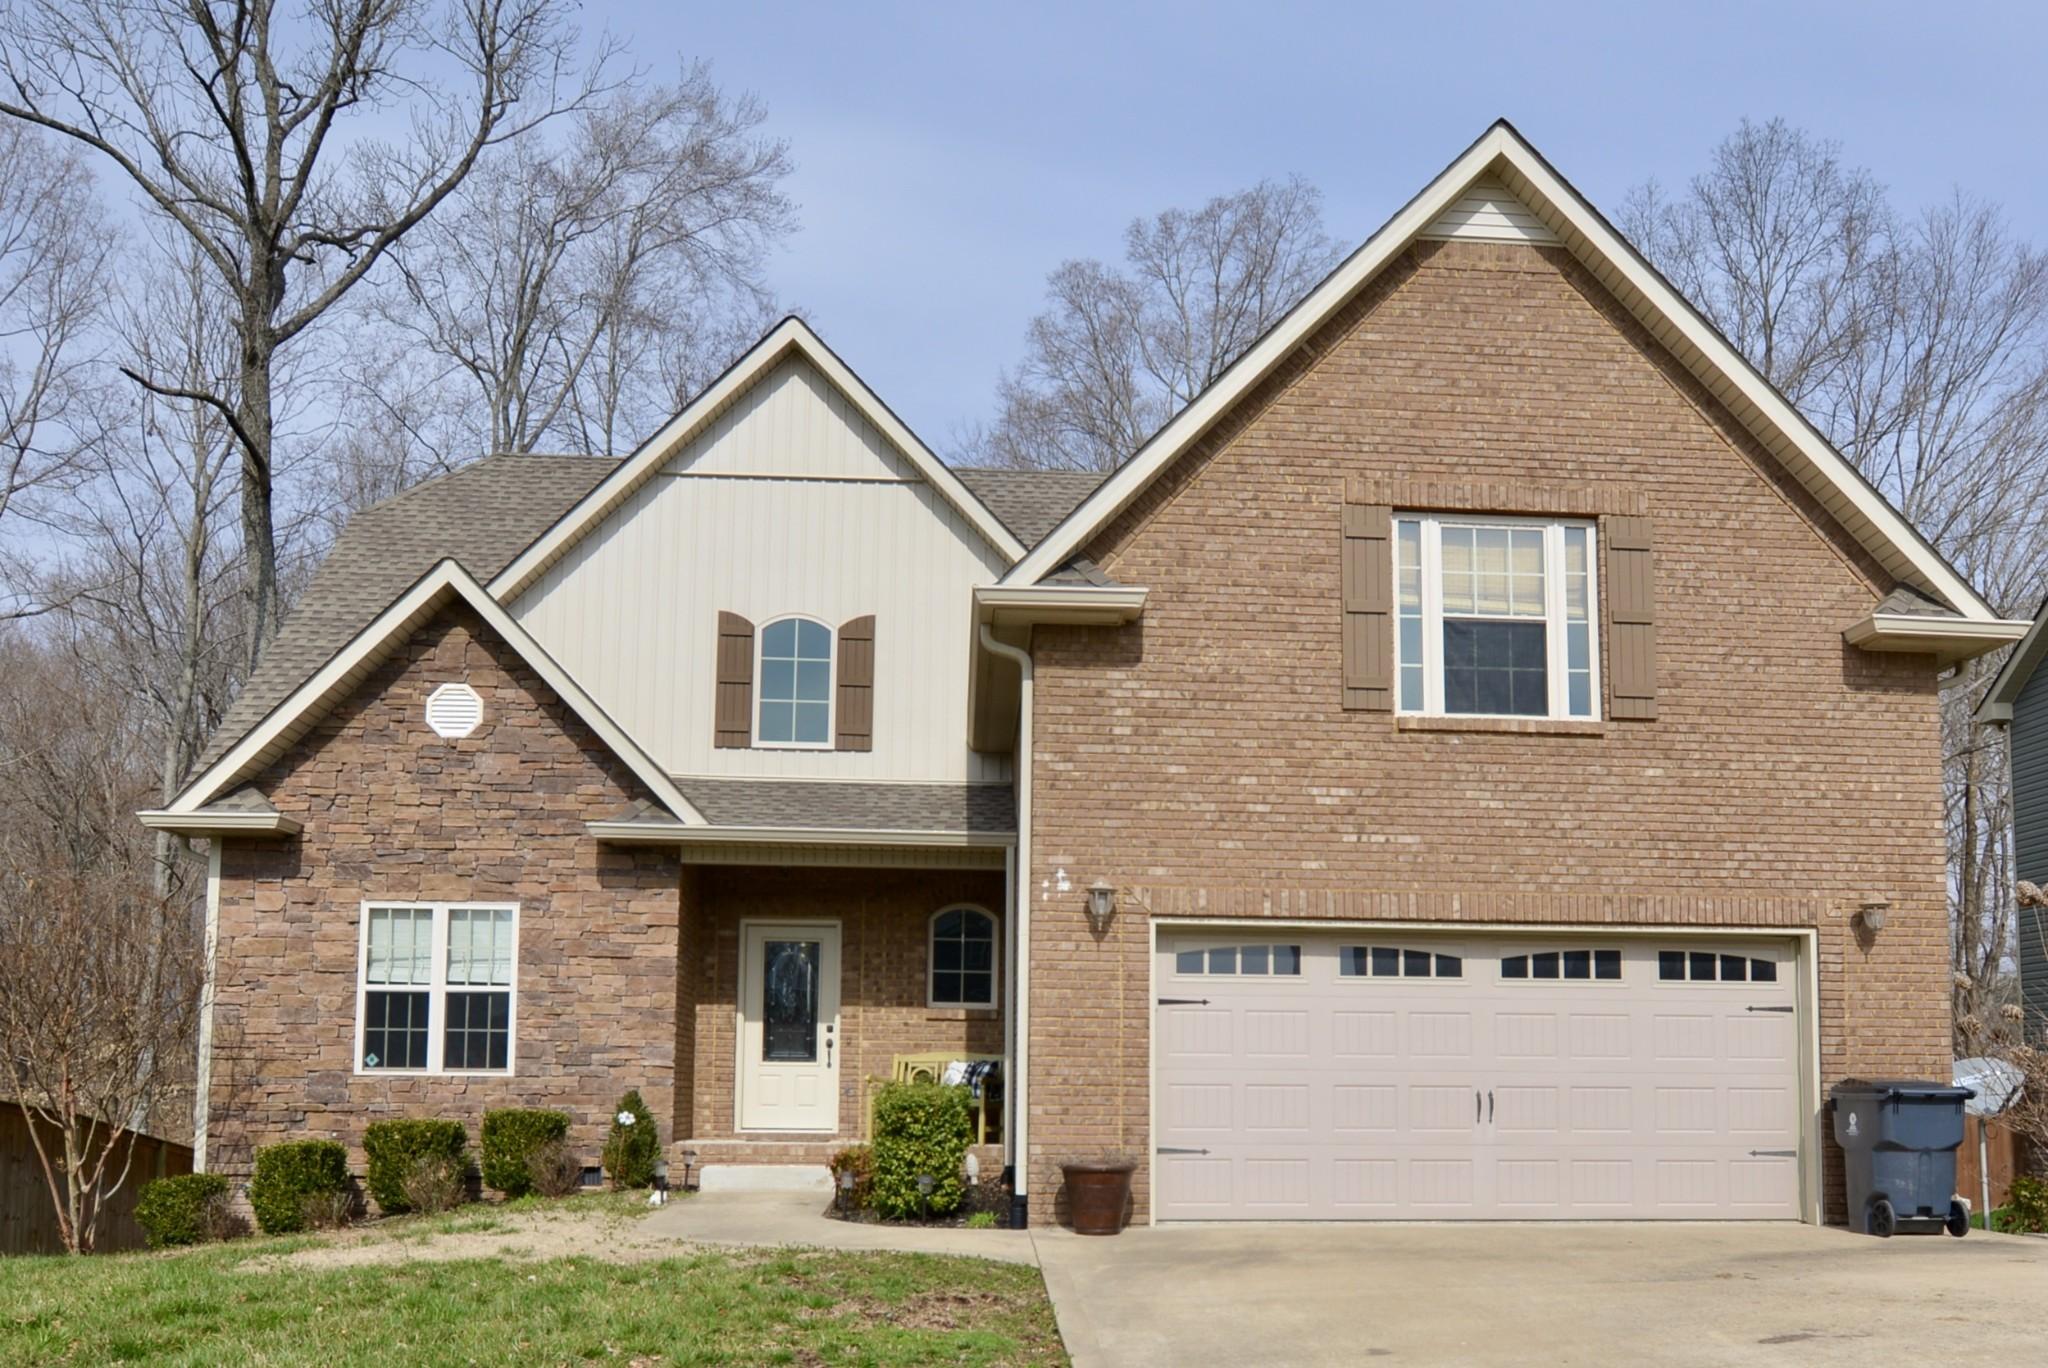 348 Abeline Dr, Clarksville, TN 37043 - Clarksville, TN real estate listing